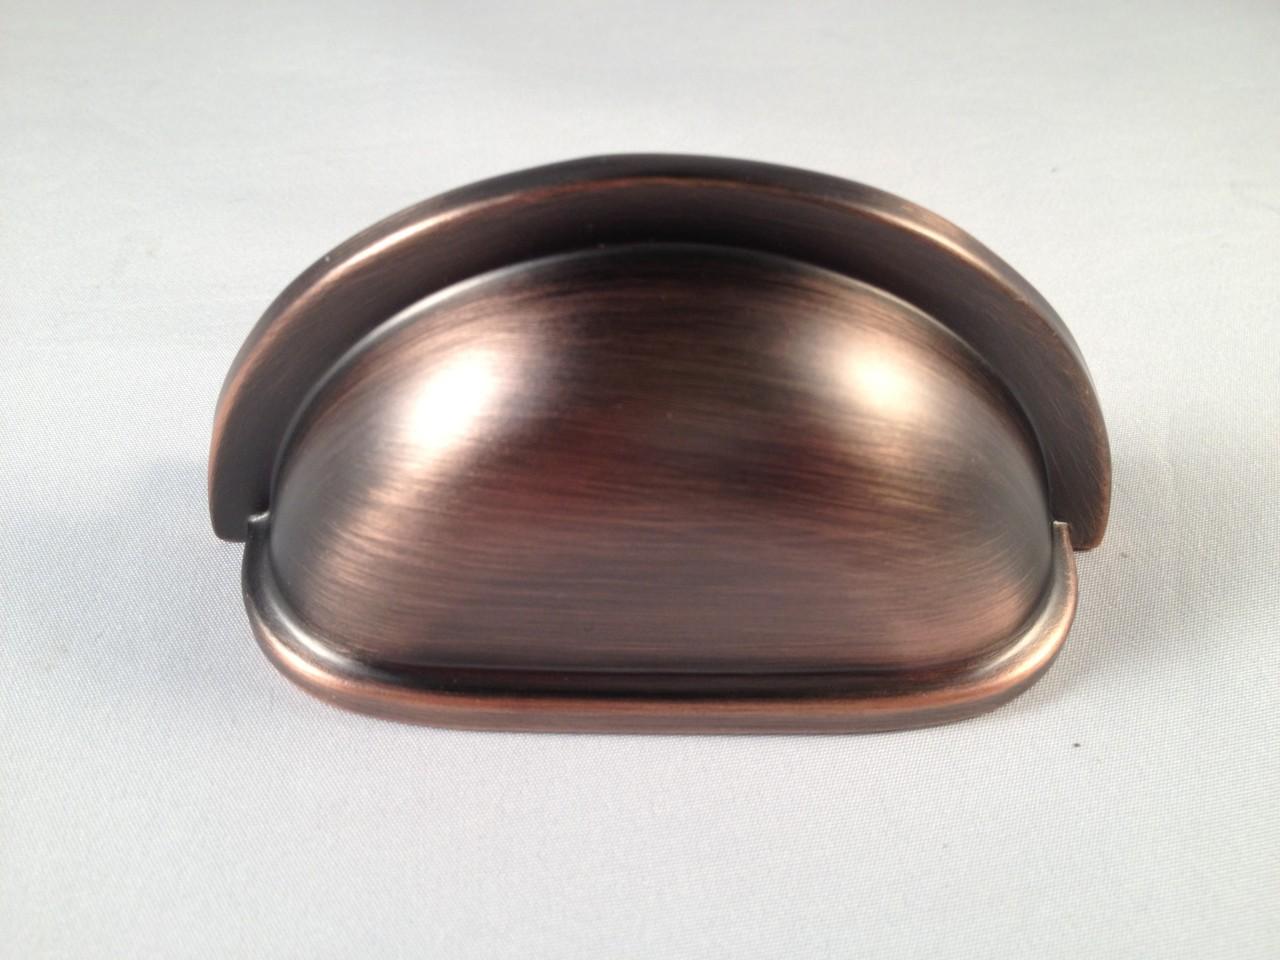 Http Www Ebay Com Itm Cup Pull Kitchen Cabinet C C 3 Antique Copper 251150932590